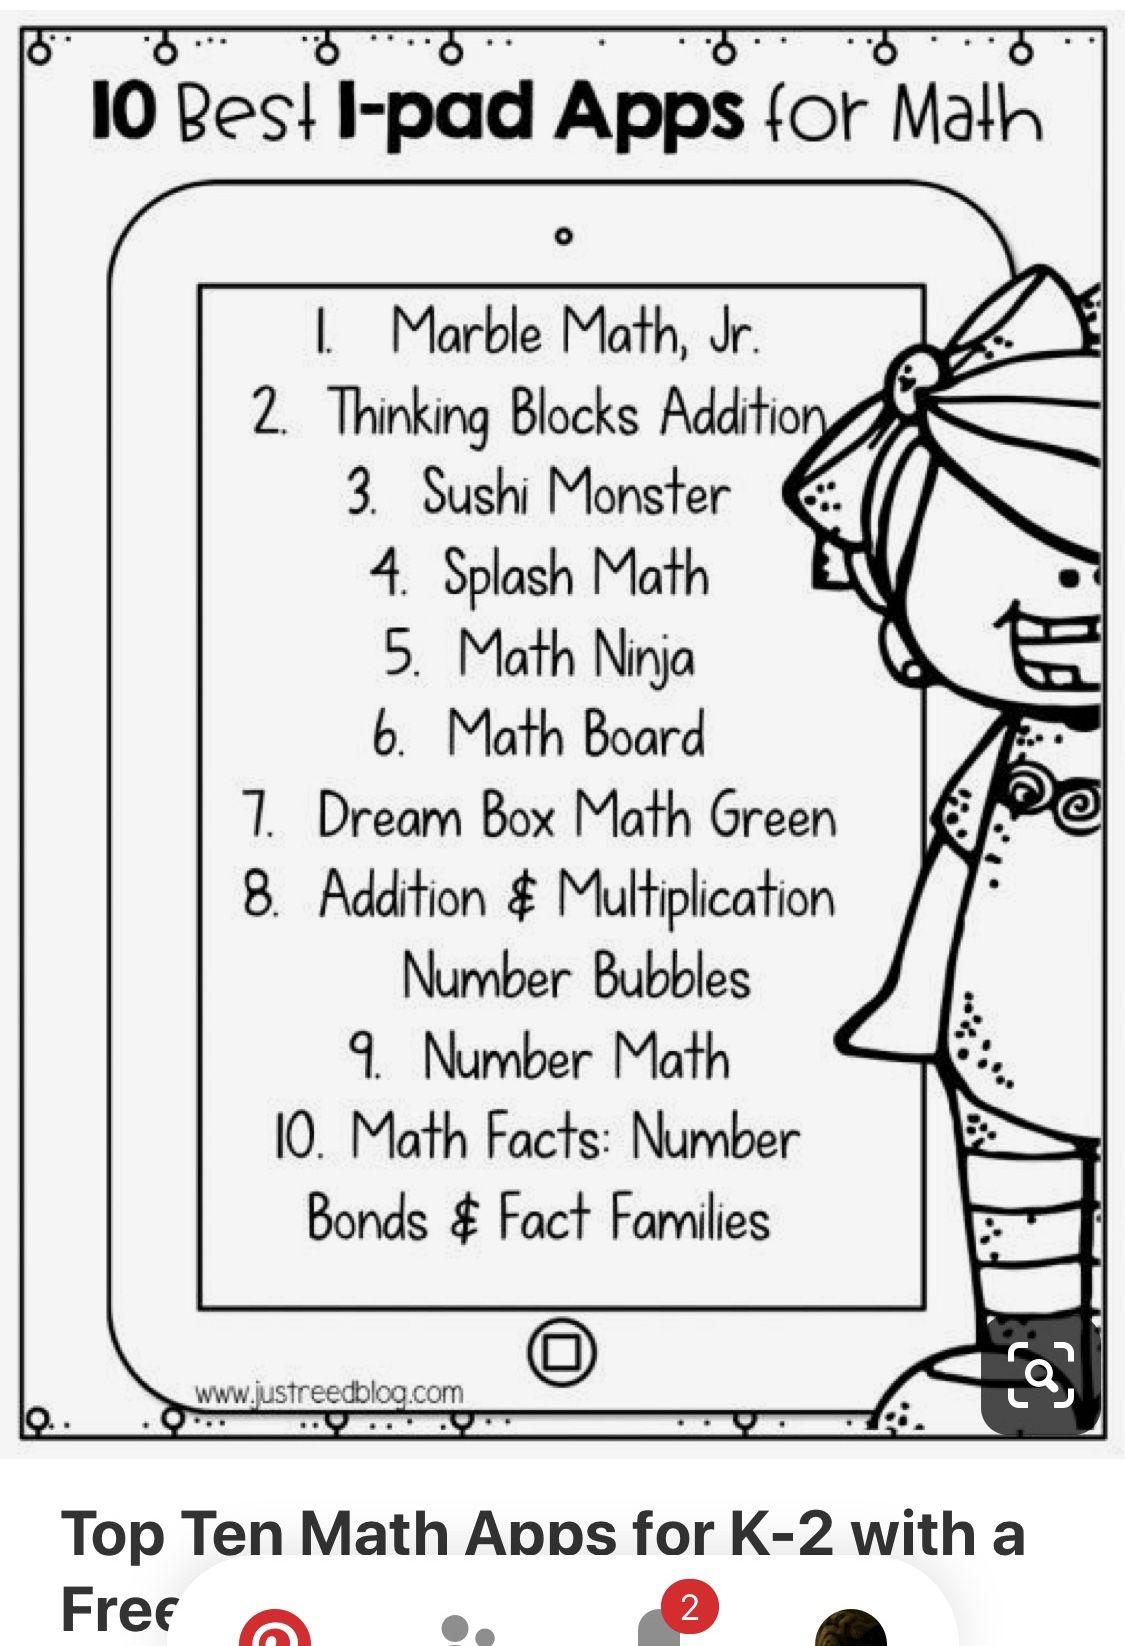 Pin By Gabby Gillenwater On 2nd Grade Math In 2020 Math Apps Homeschool Math Learning Math [ 1646 x 1125 Pixel ]